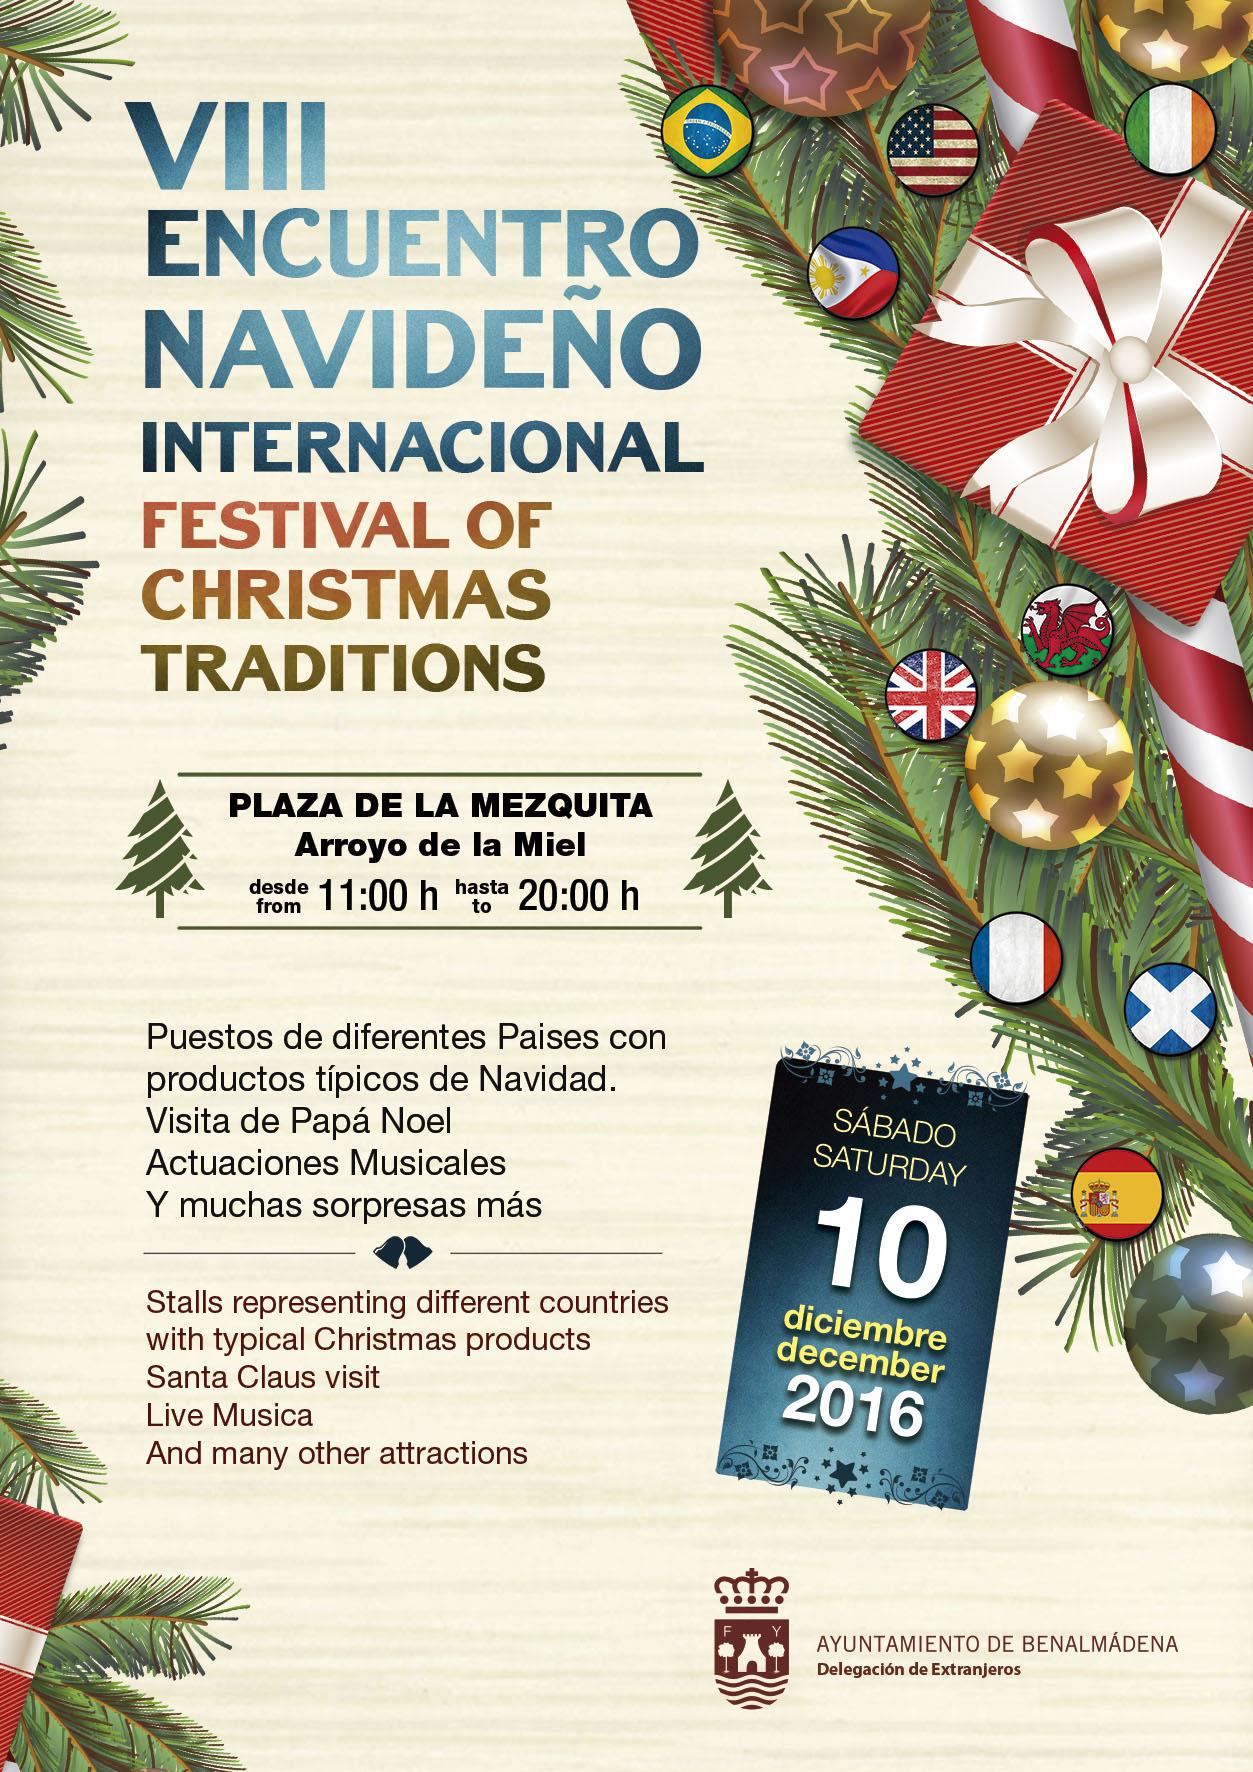 VIII Encuentro Navideño Internacional